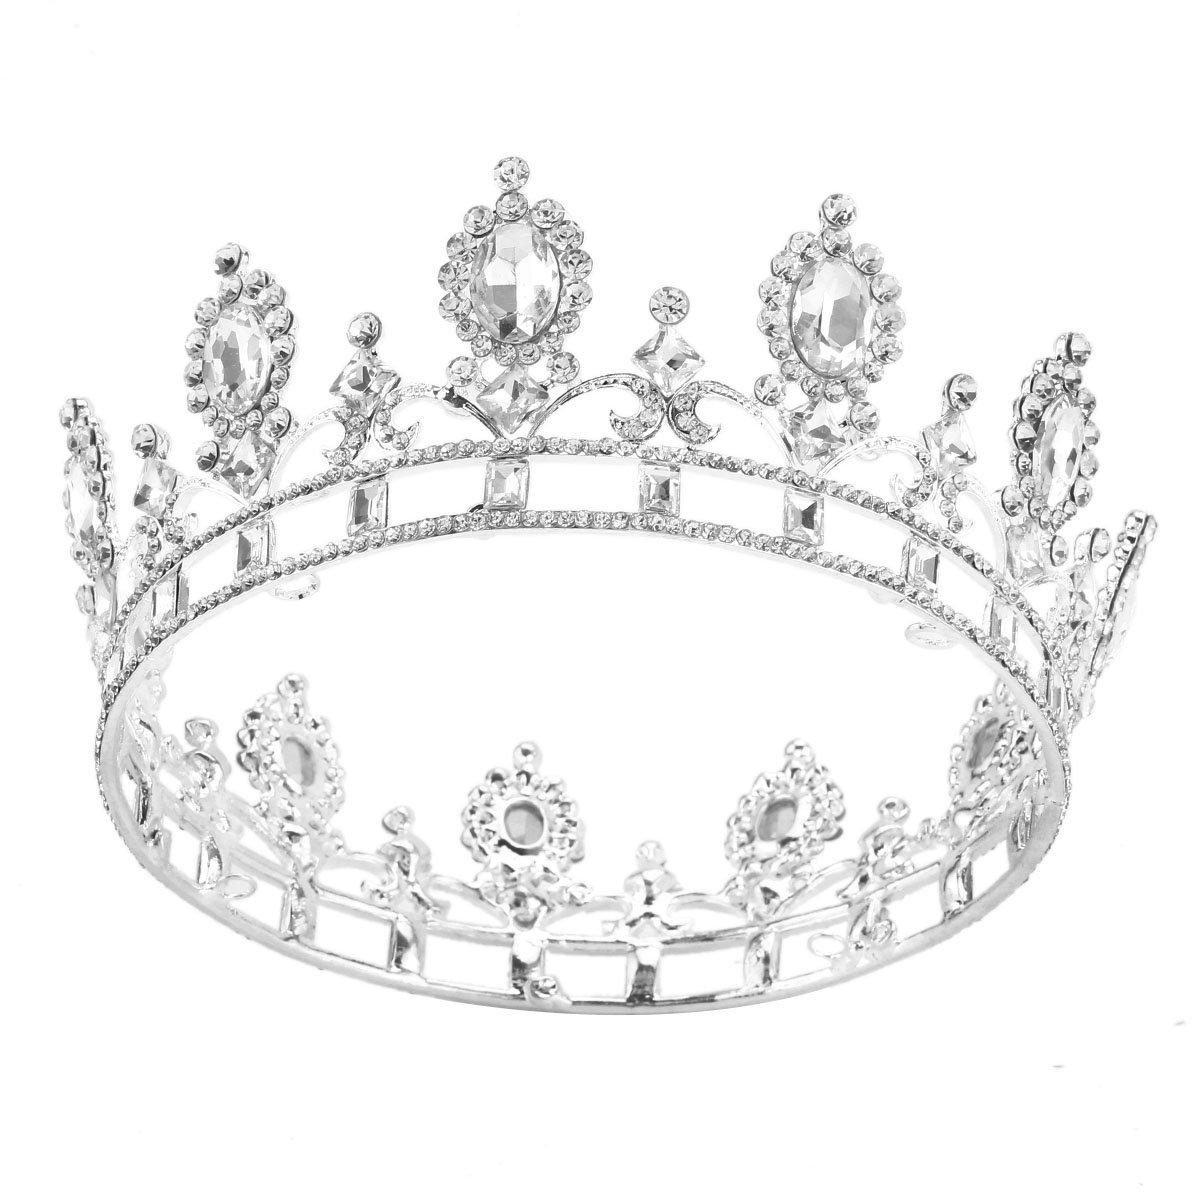 Stuffwholesale Oval Stone Wedding Pageant Crown Rhinestone Women Hair Accessories (Silver)